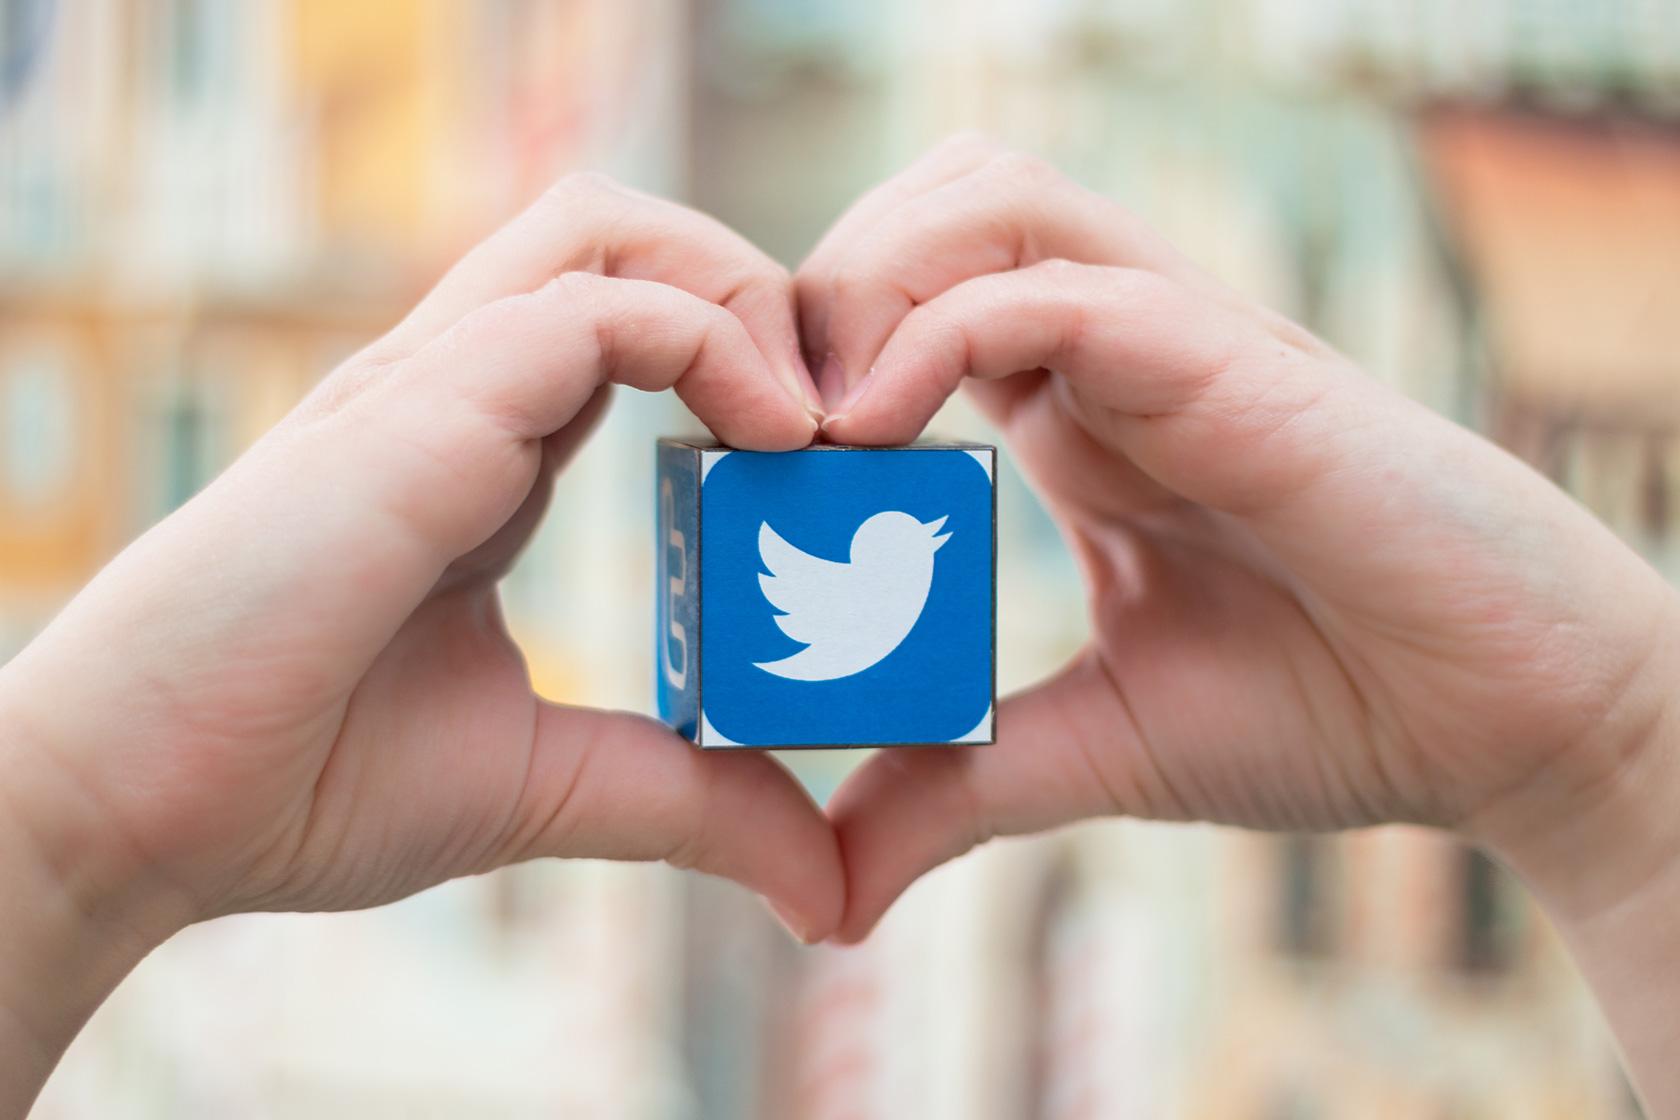 Follow Best Home Interior Designers On Twitter